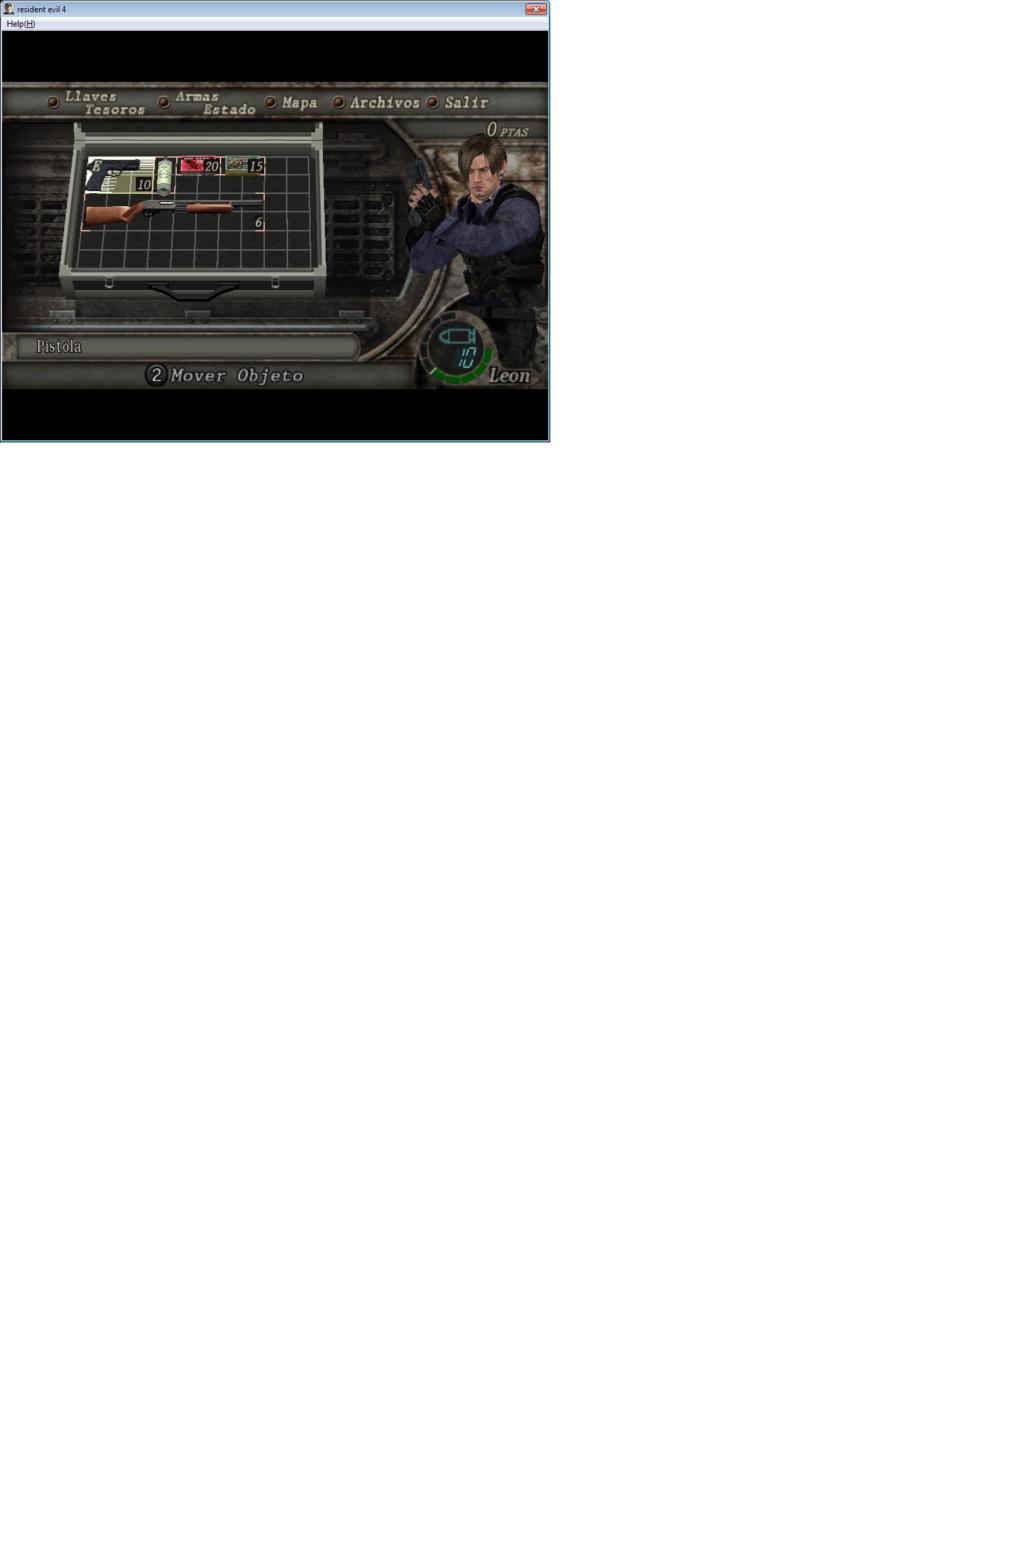 Super Mod de Resident evil 6 para Resident evil 4 y nuevo equipo Captur10